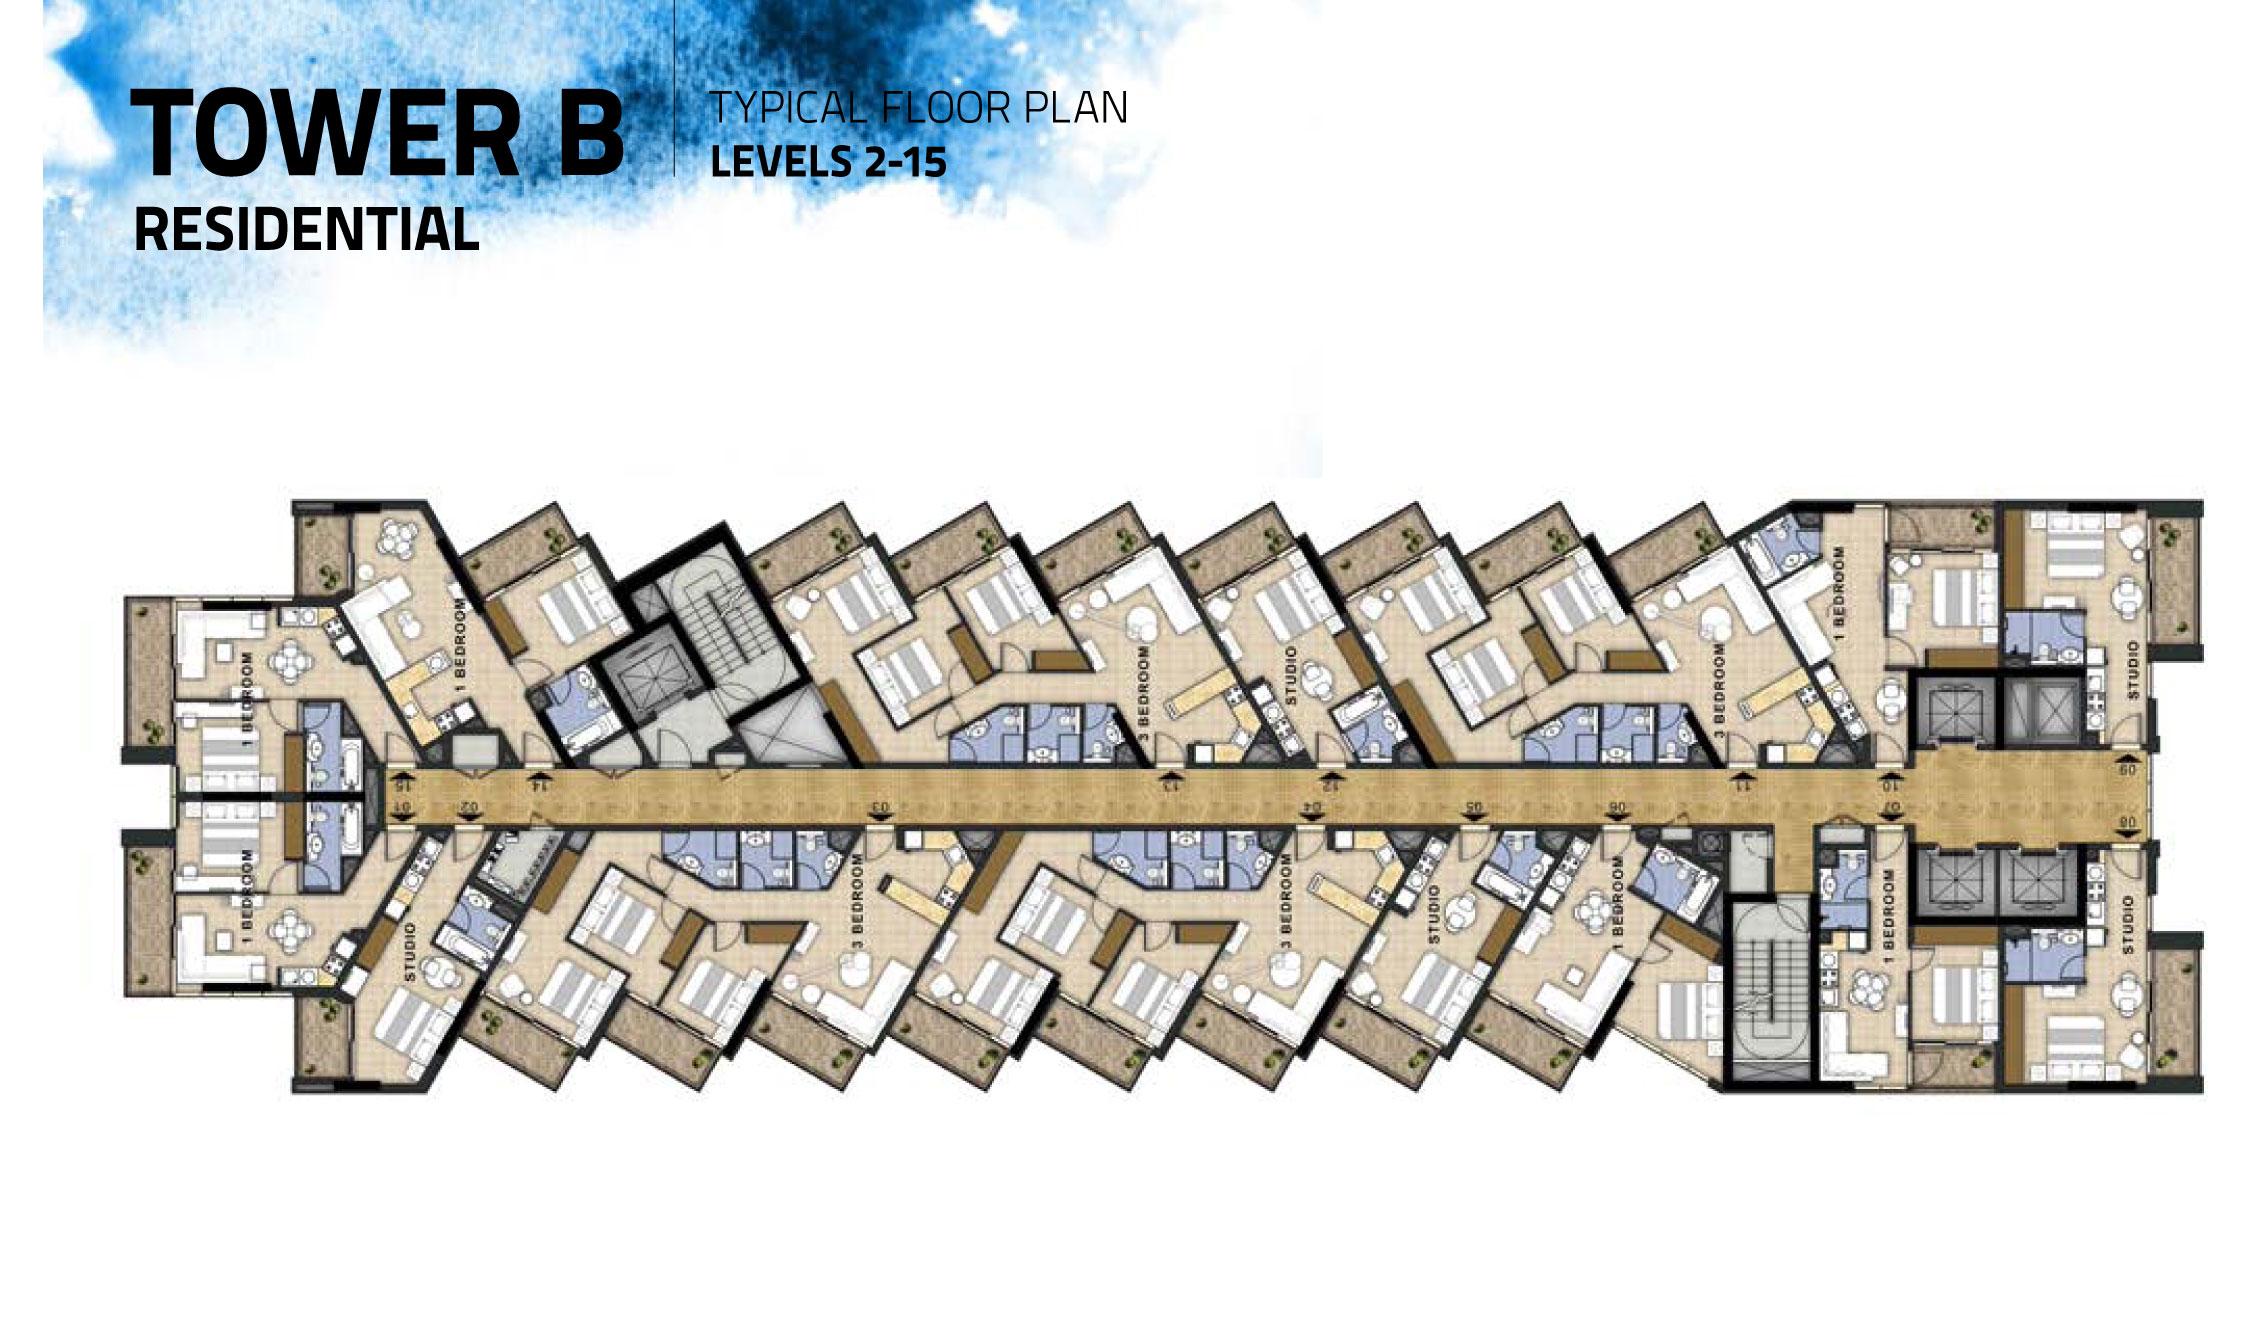 Tower-B-Level-2-15